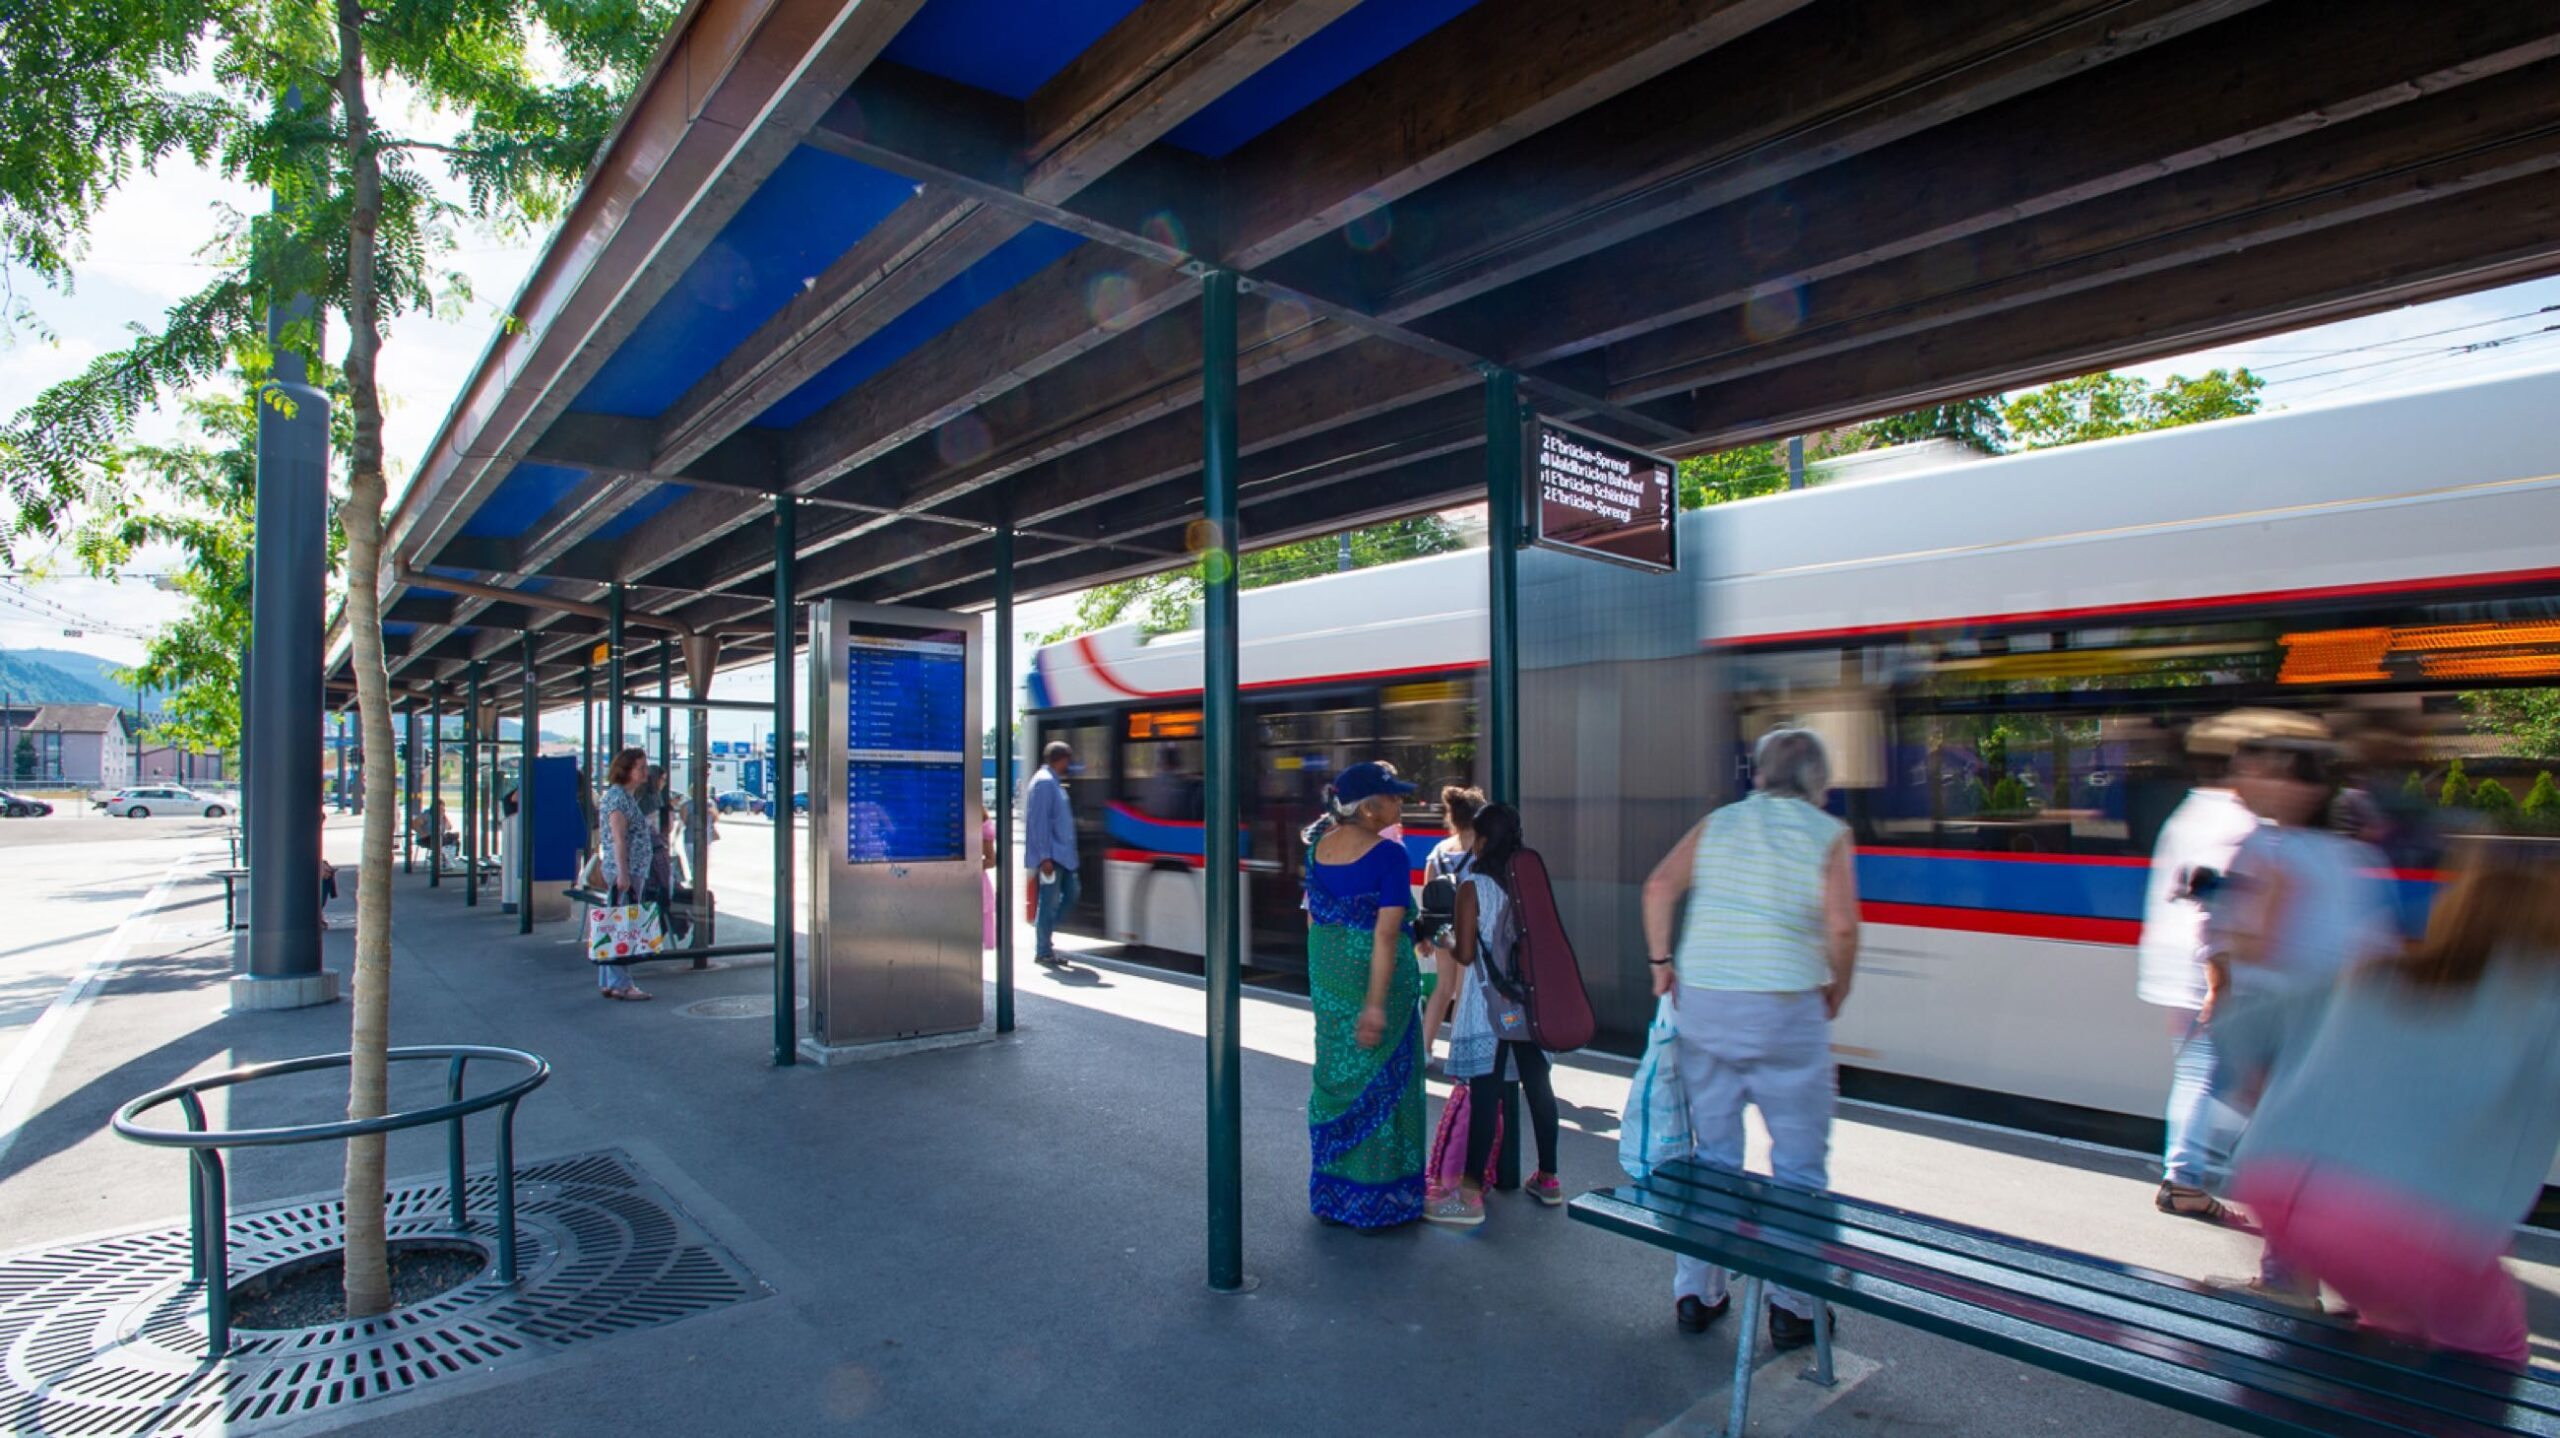 Busbahnhof in Emmenbrücke